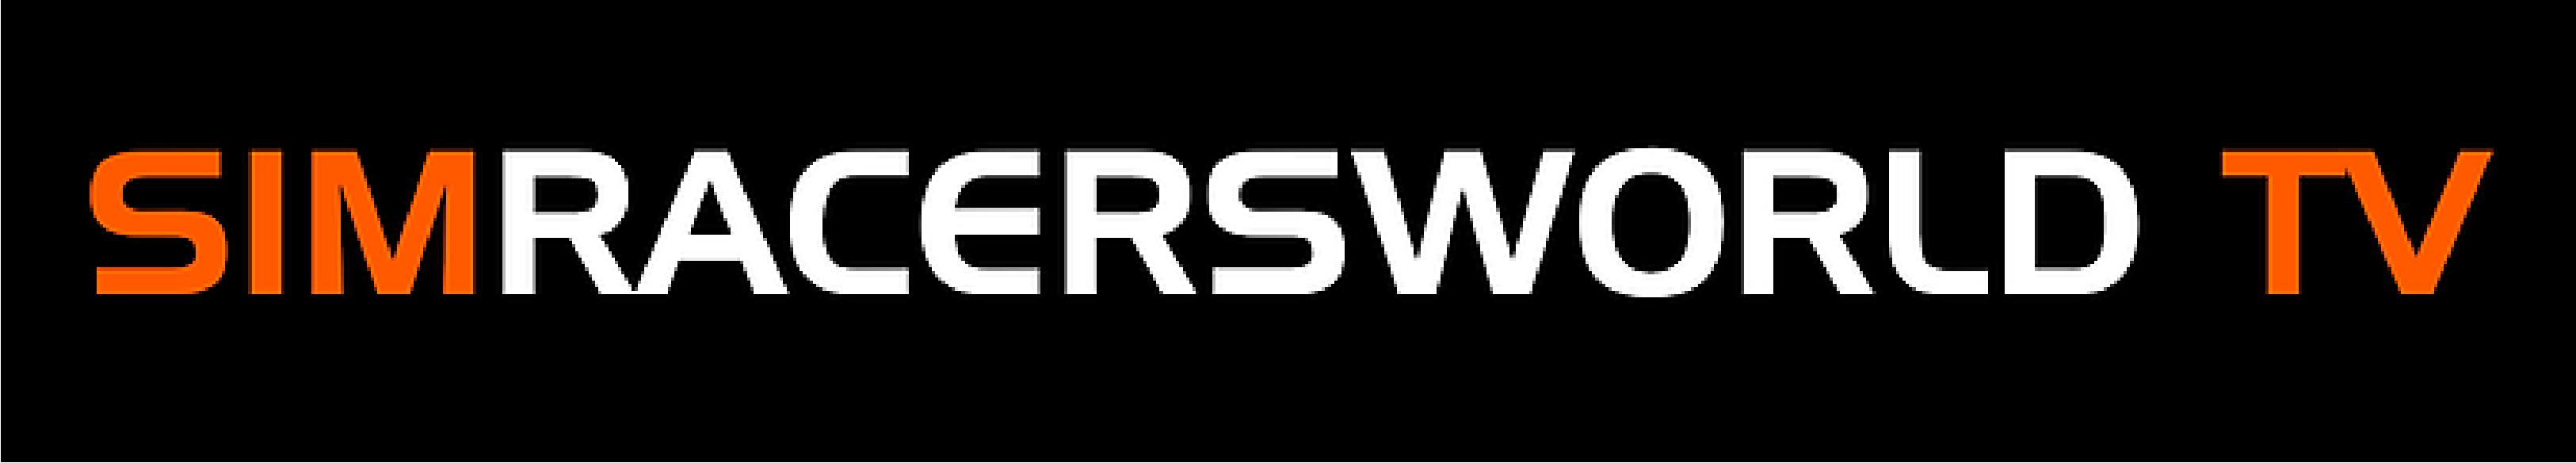 srw web banner